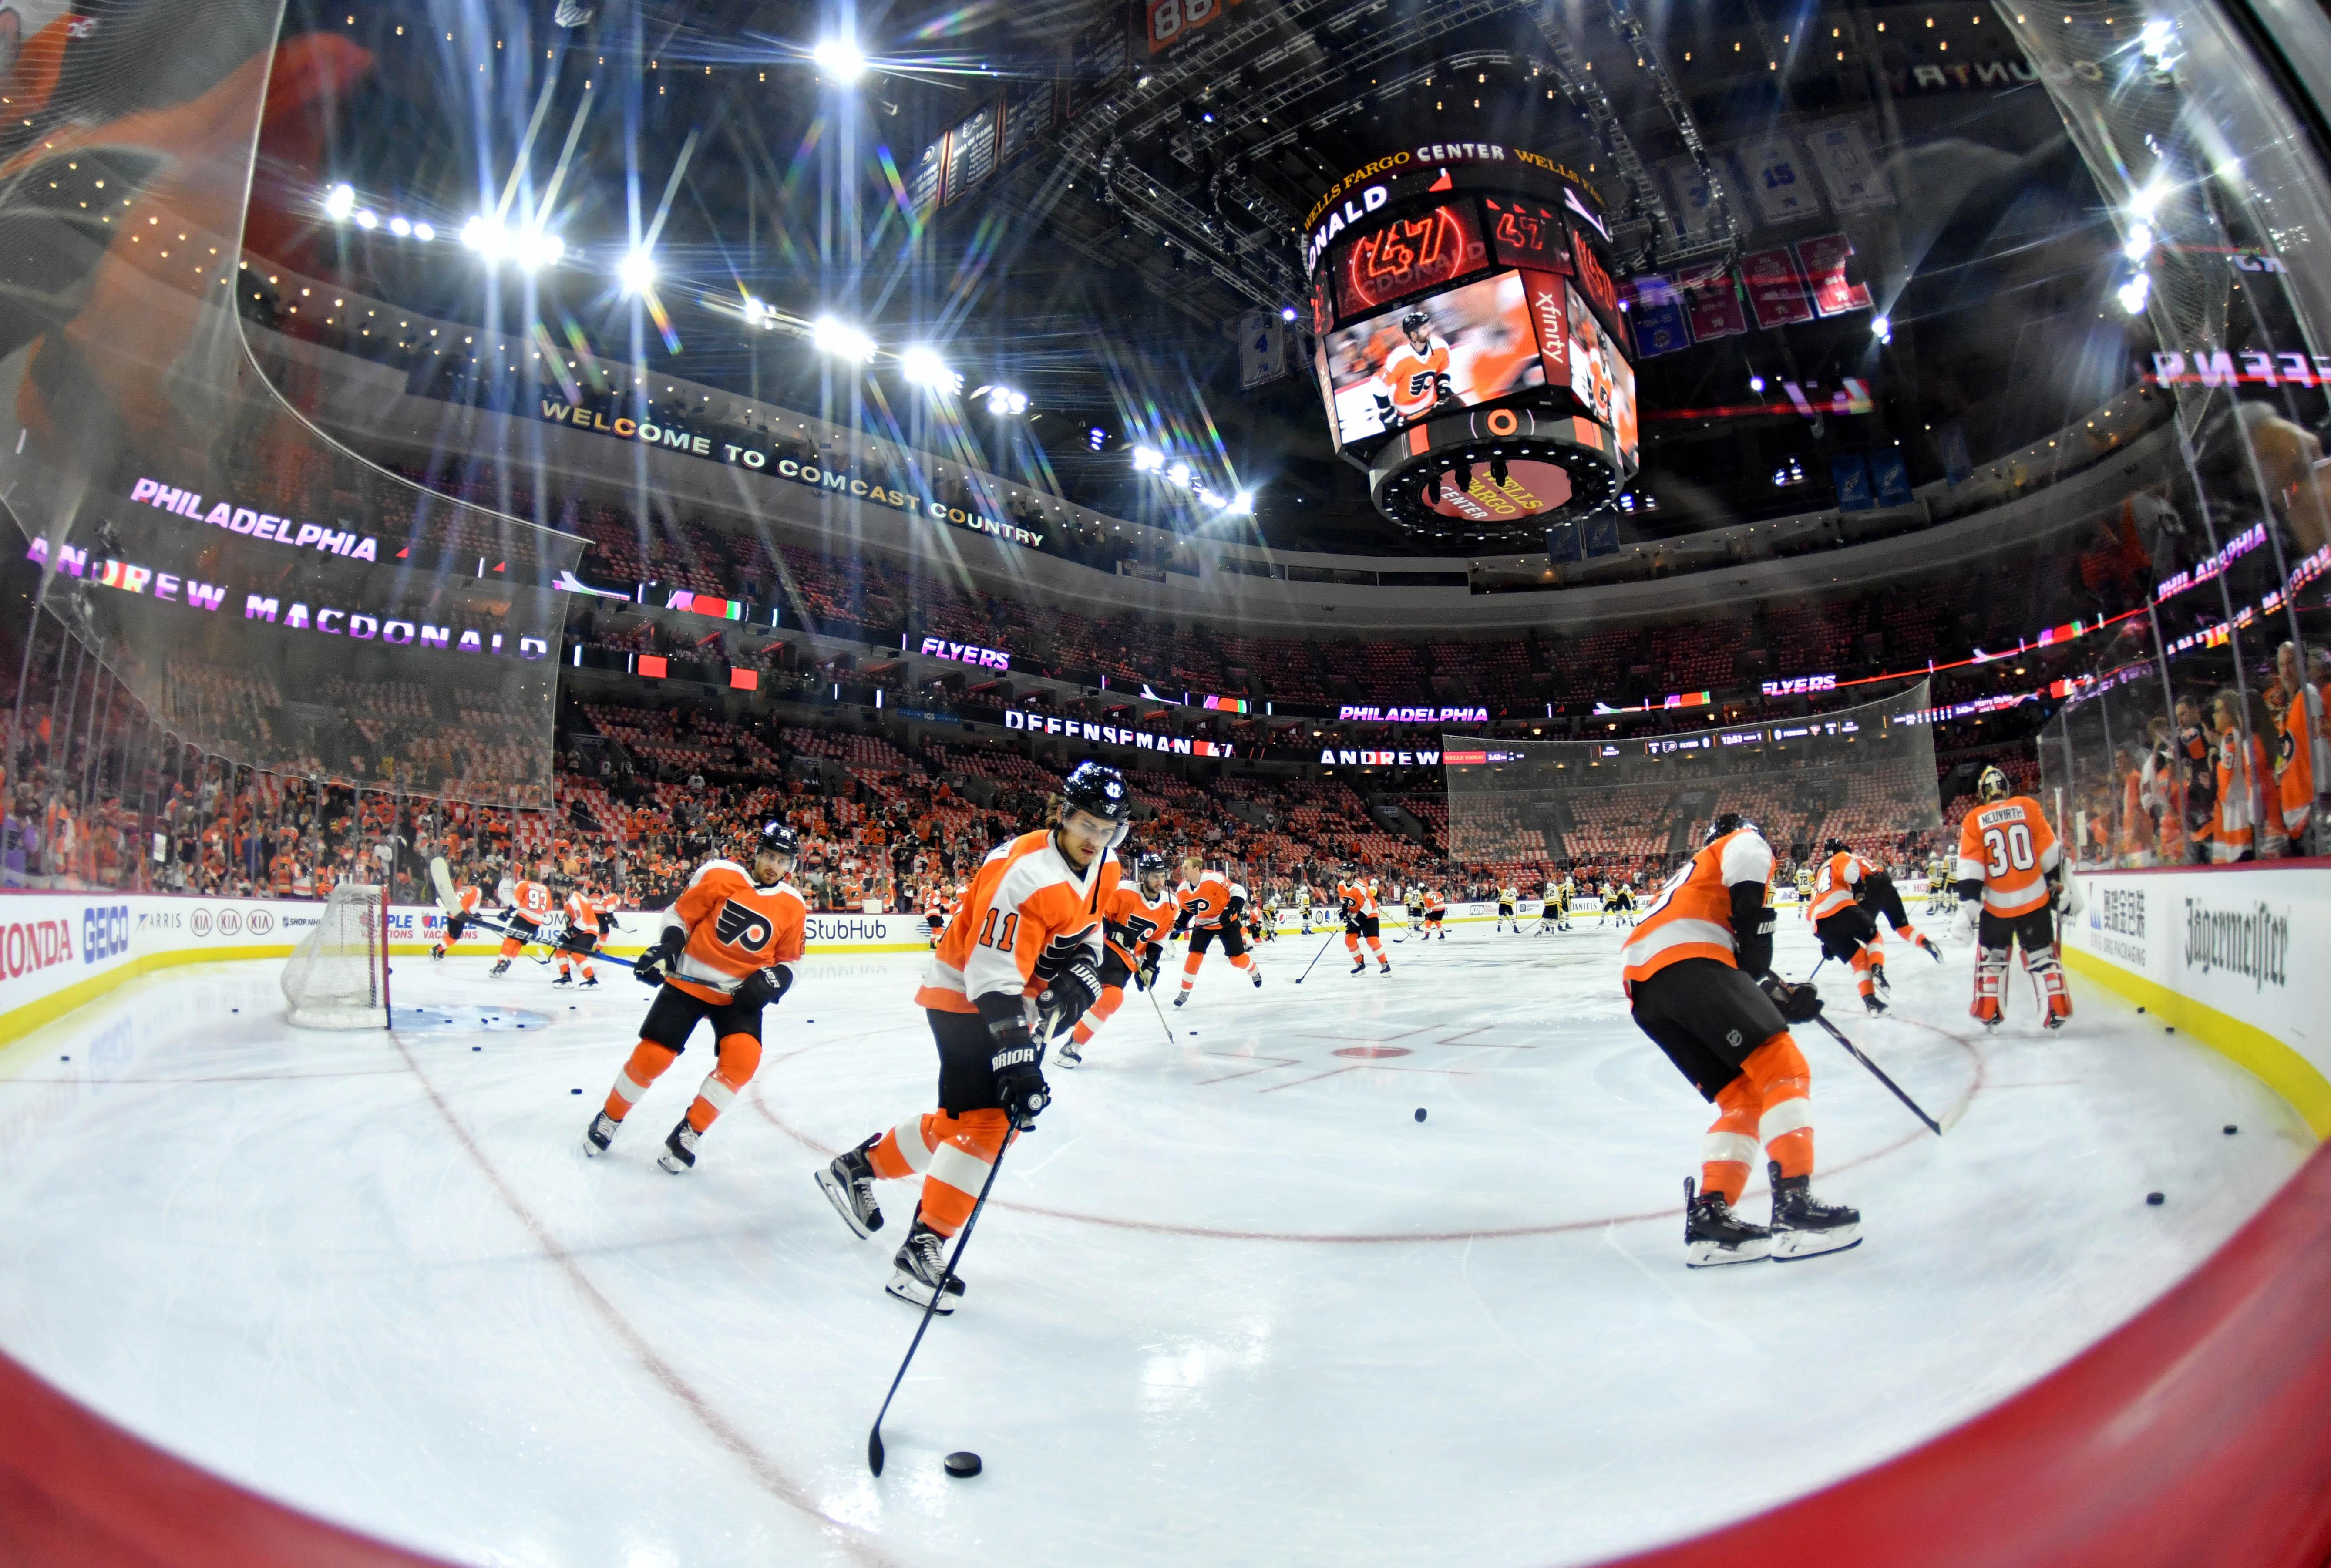 A goodbye to the 2017-18 Philadelphia Flyers